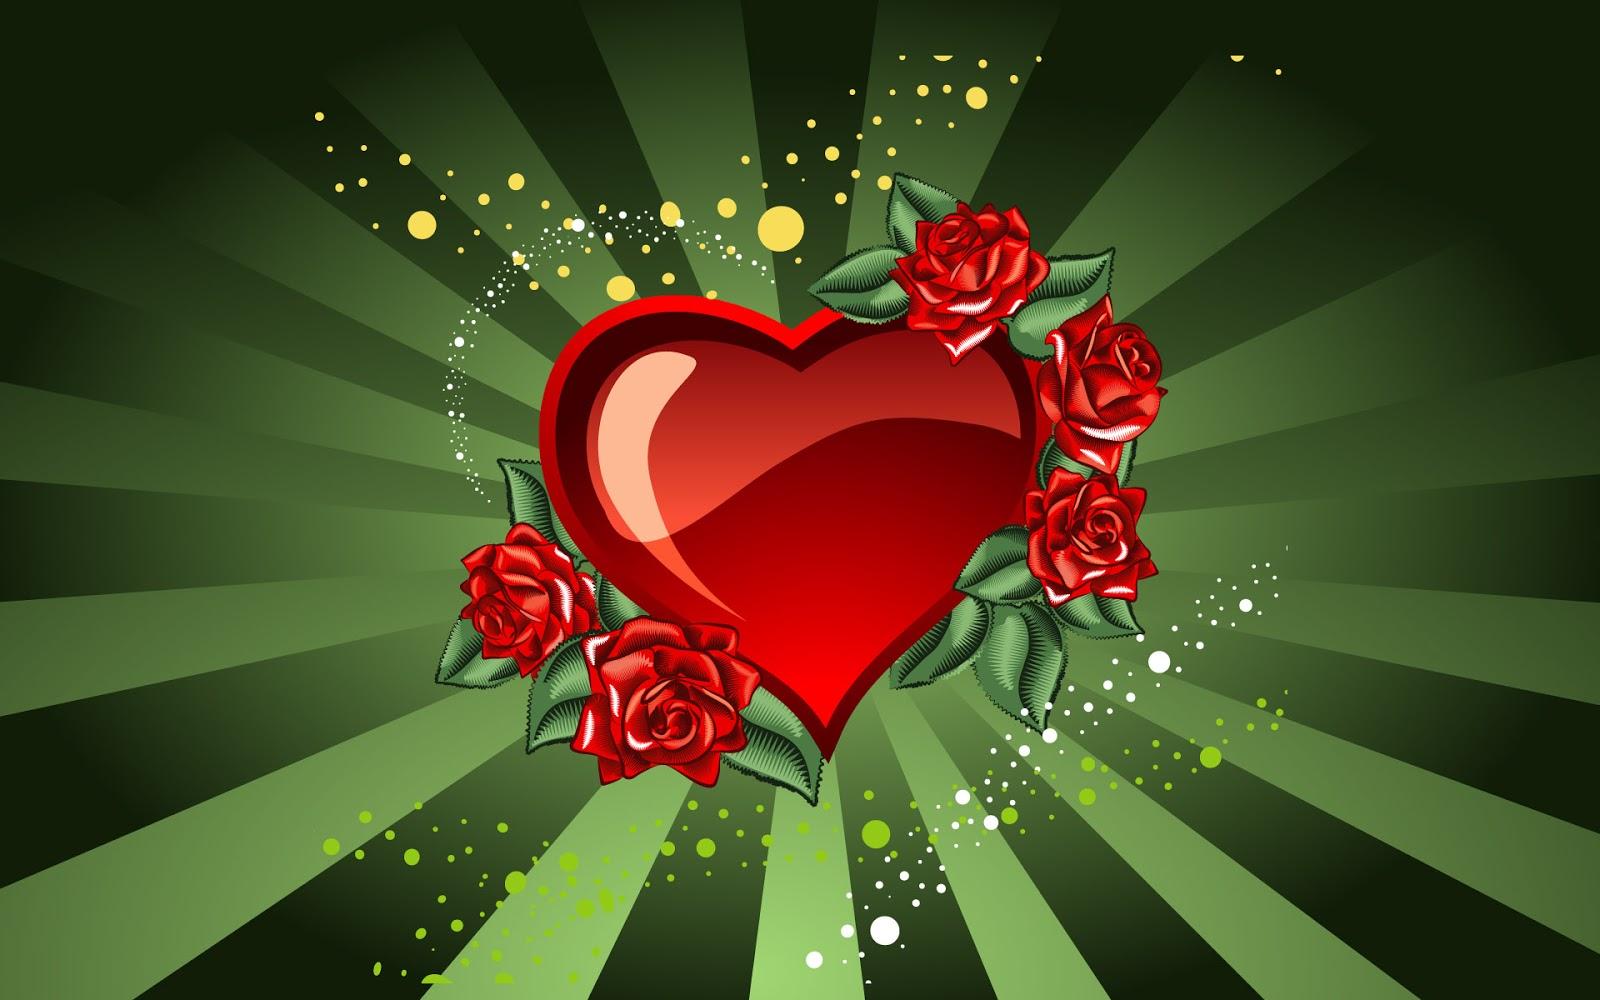 http://1.bp.blogspot.com/-mH4tS-jWflw/UPwWO71ClvI/AAAAAAAABCc/_MibmW_aDG0/s1600/valentine%27s+day+wallpaper-nacozinhacomamalves.blogspot.com-102054.jpg